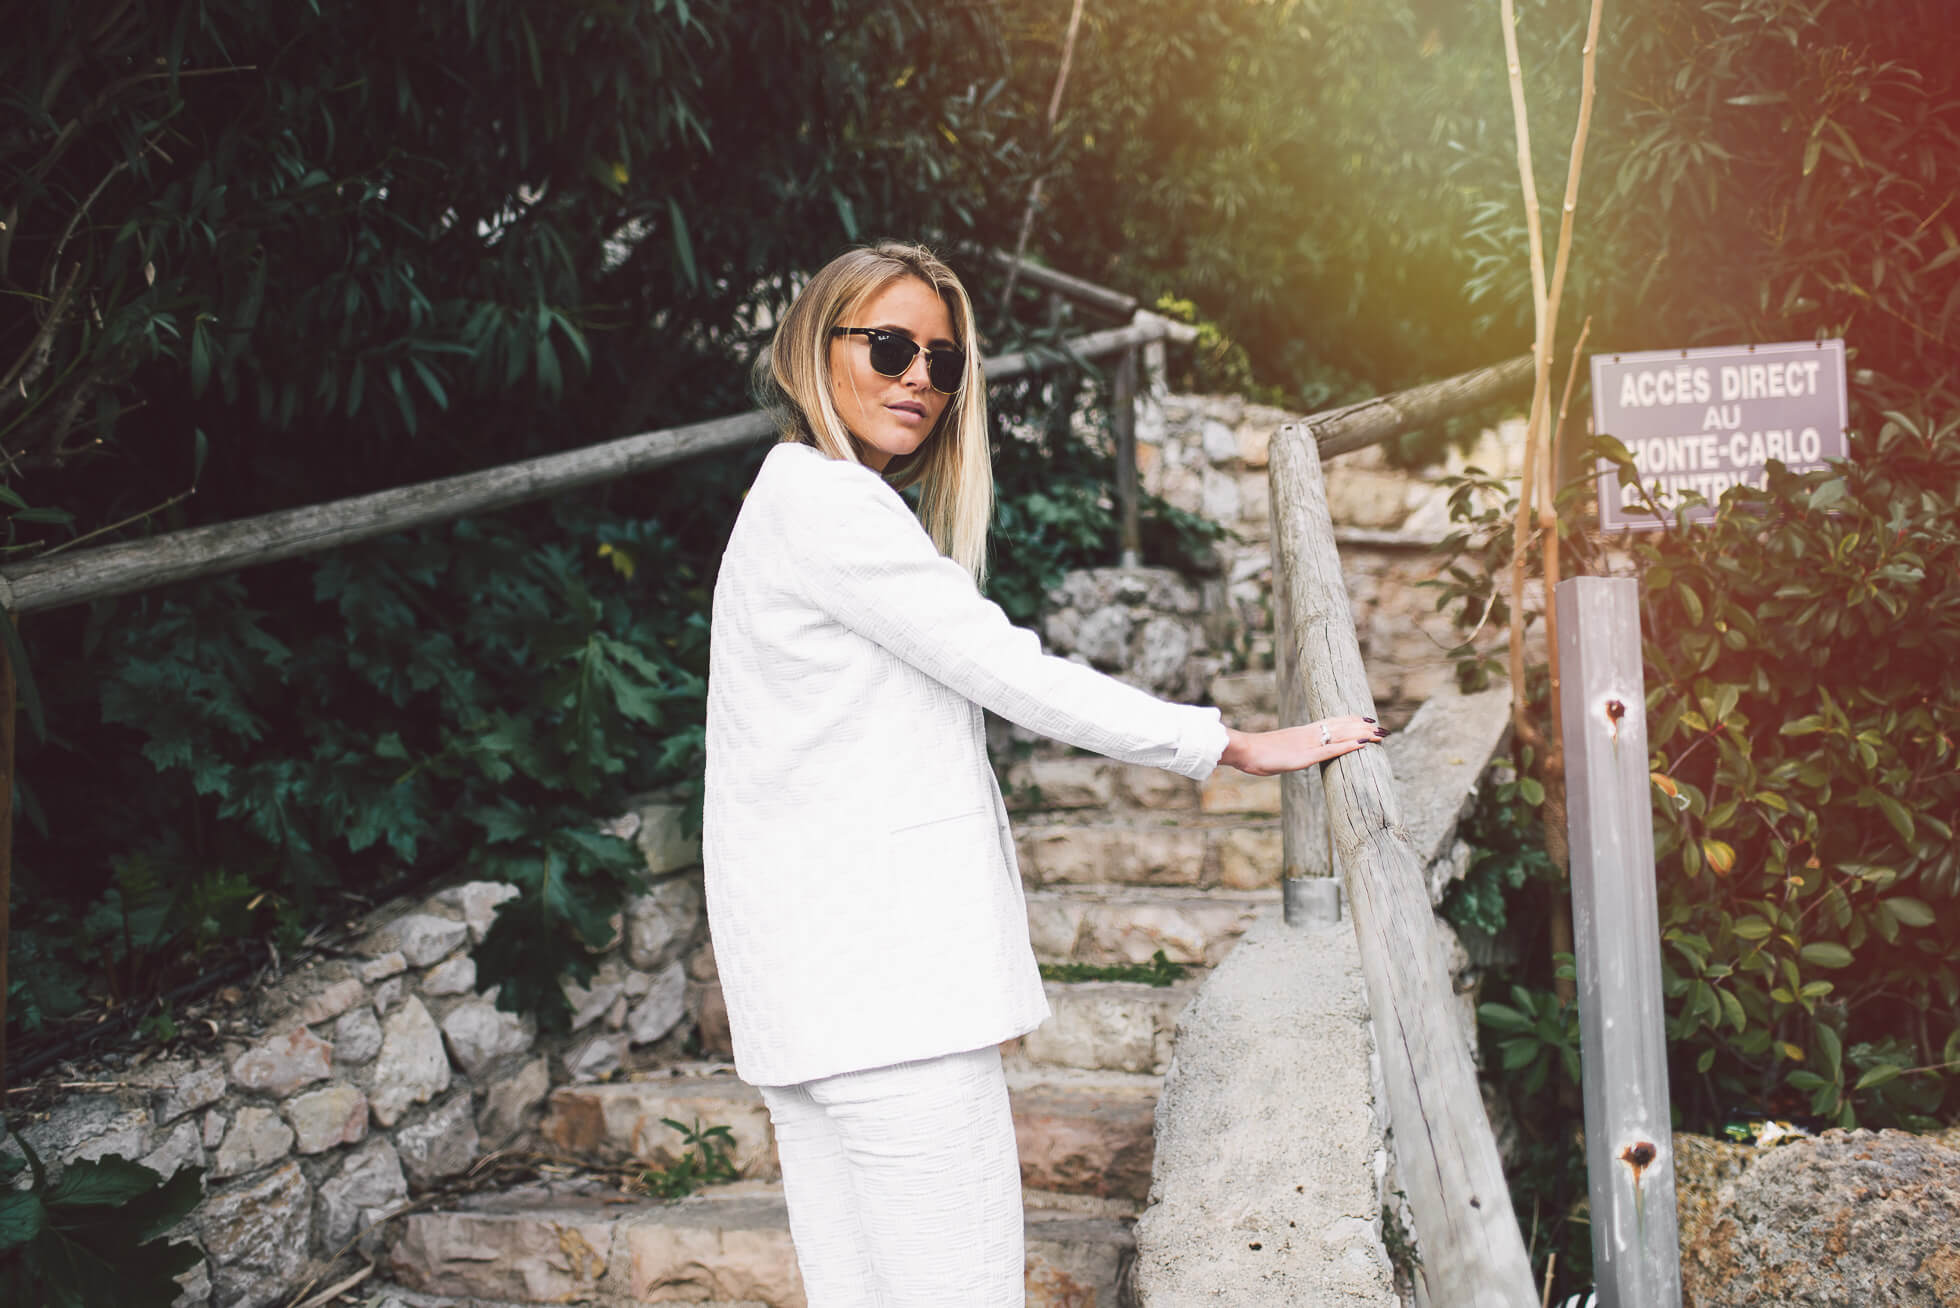 janni-deler-white-suitDSC_6948-Redigera